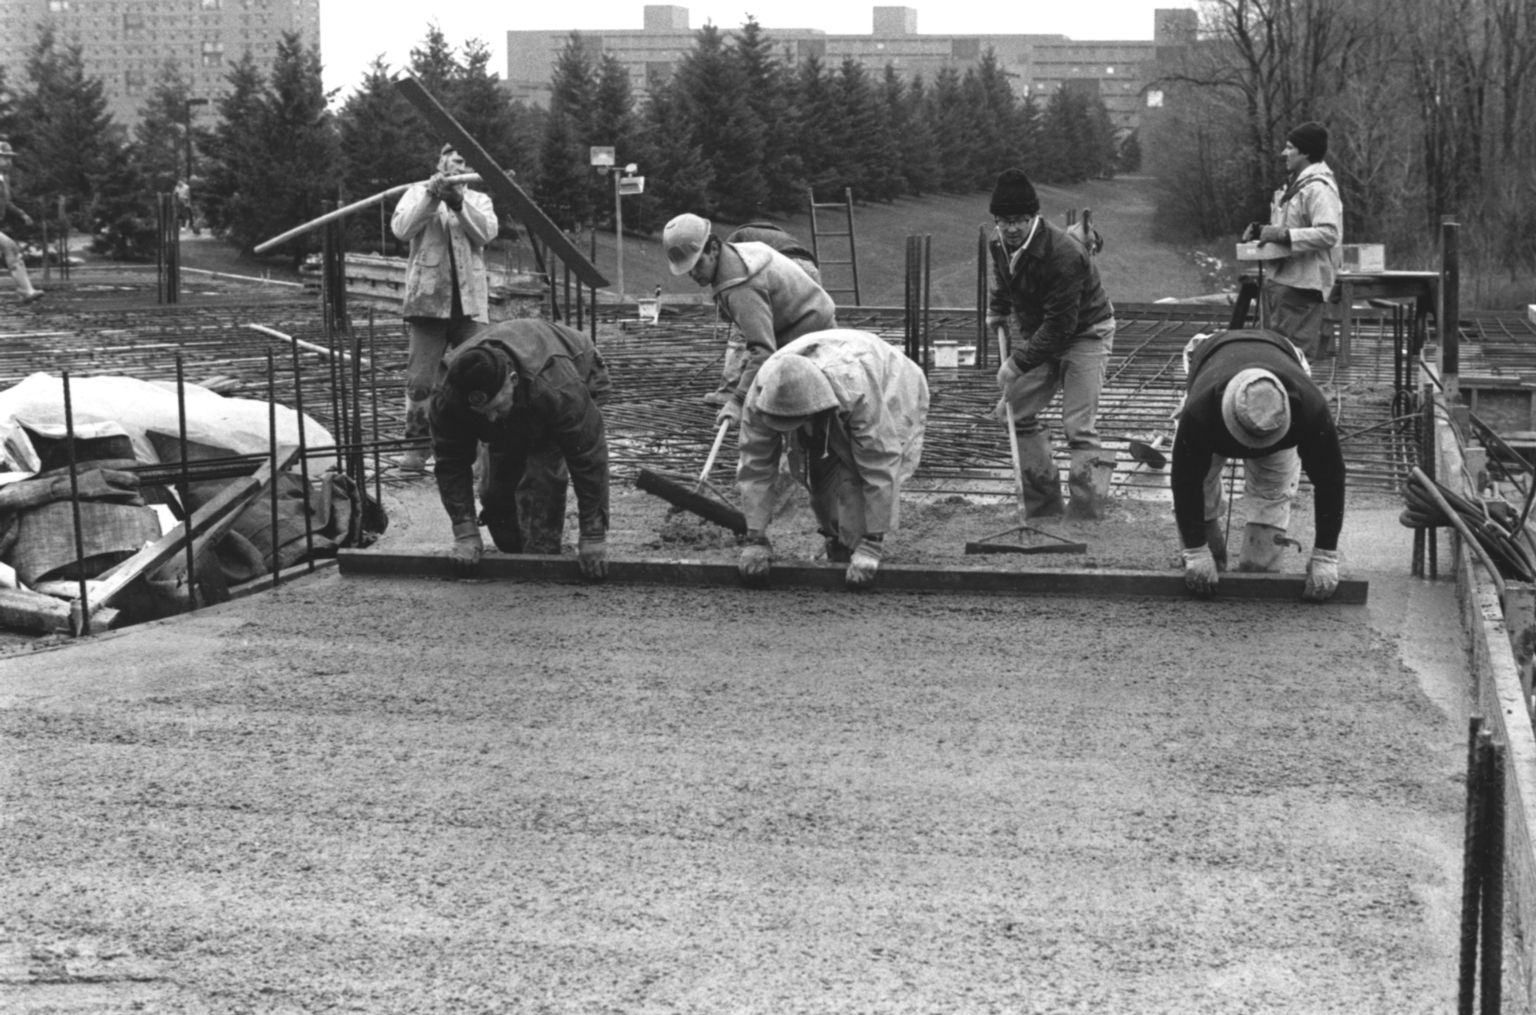 Leveling Concrete at the Kilian J. and Caroline F. Schmitt Interfaith Center Construction Site